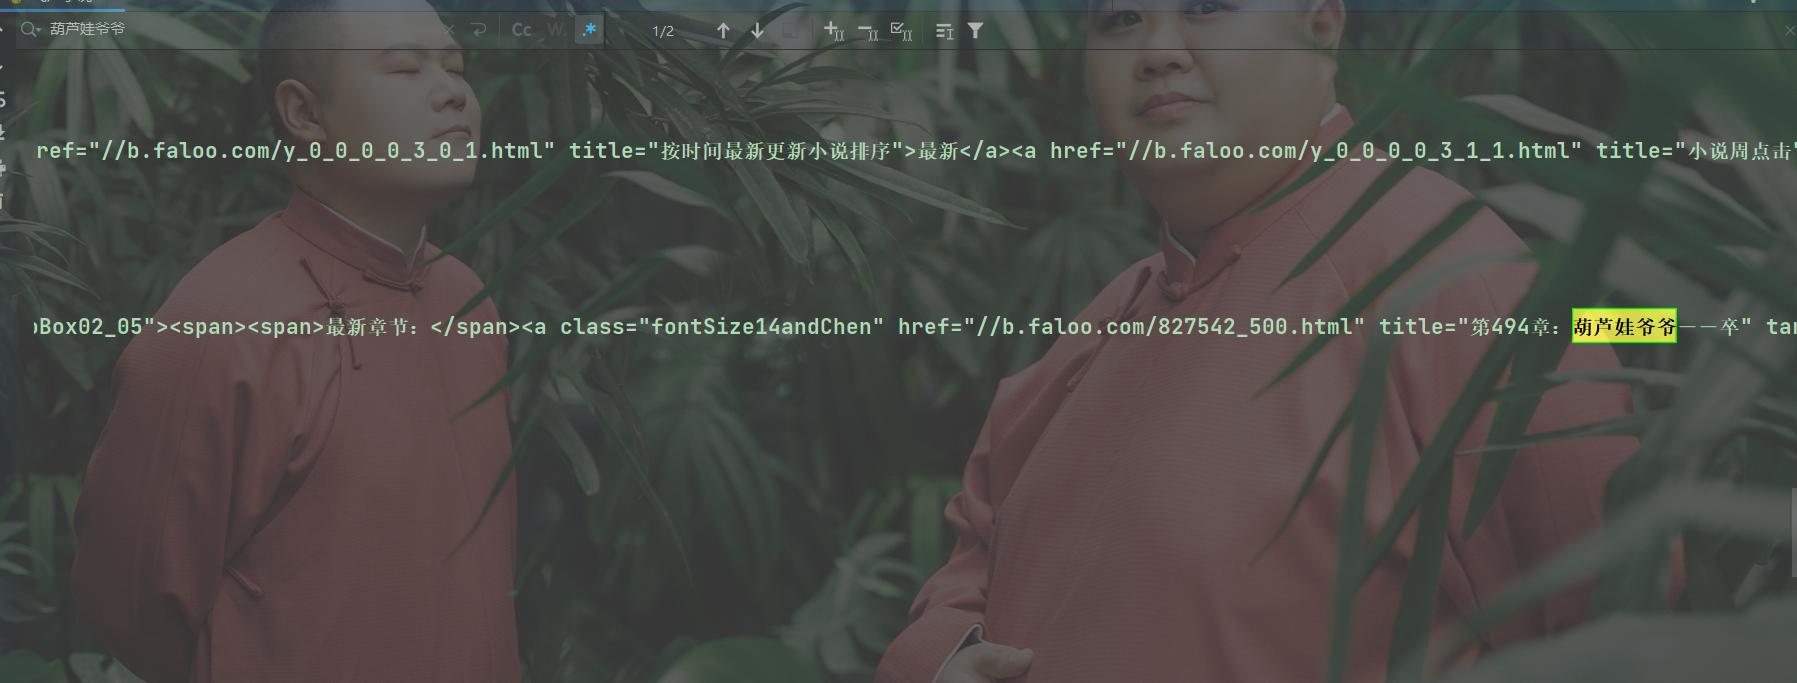 Python爬蟲(二)——傳送請求